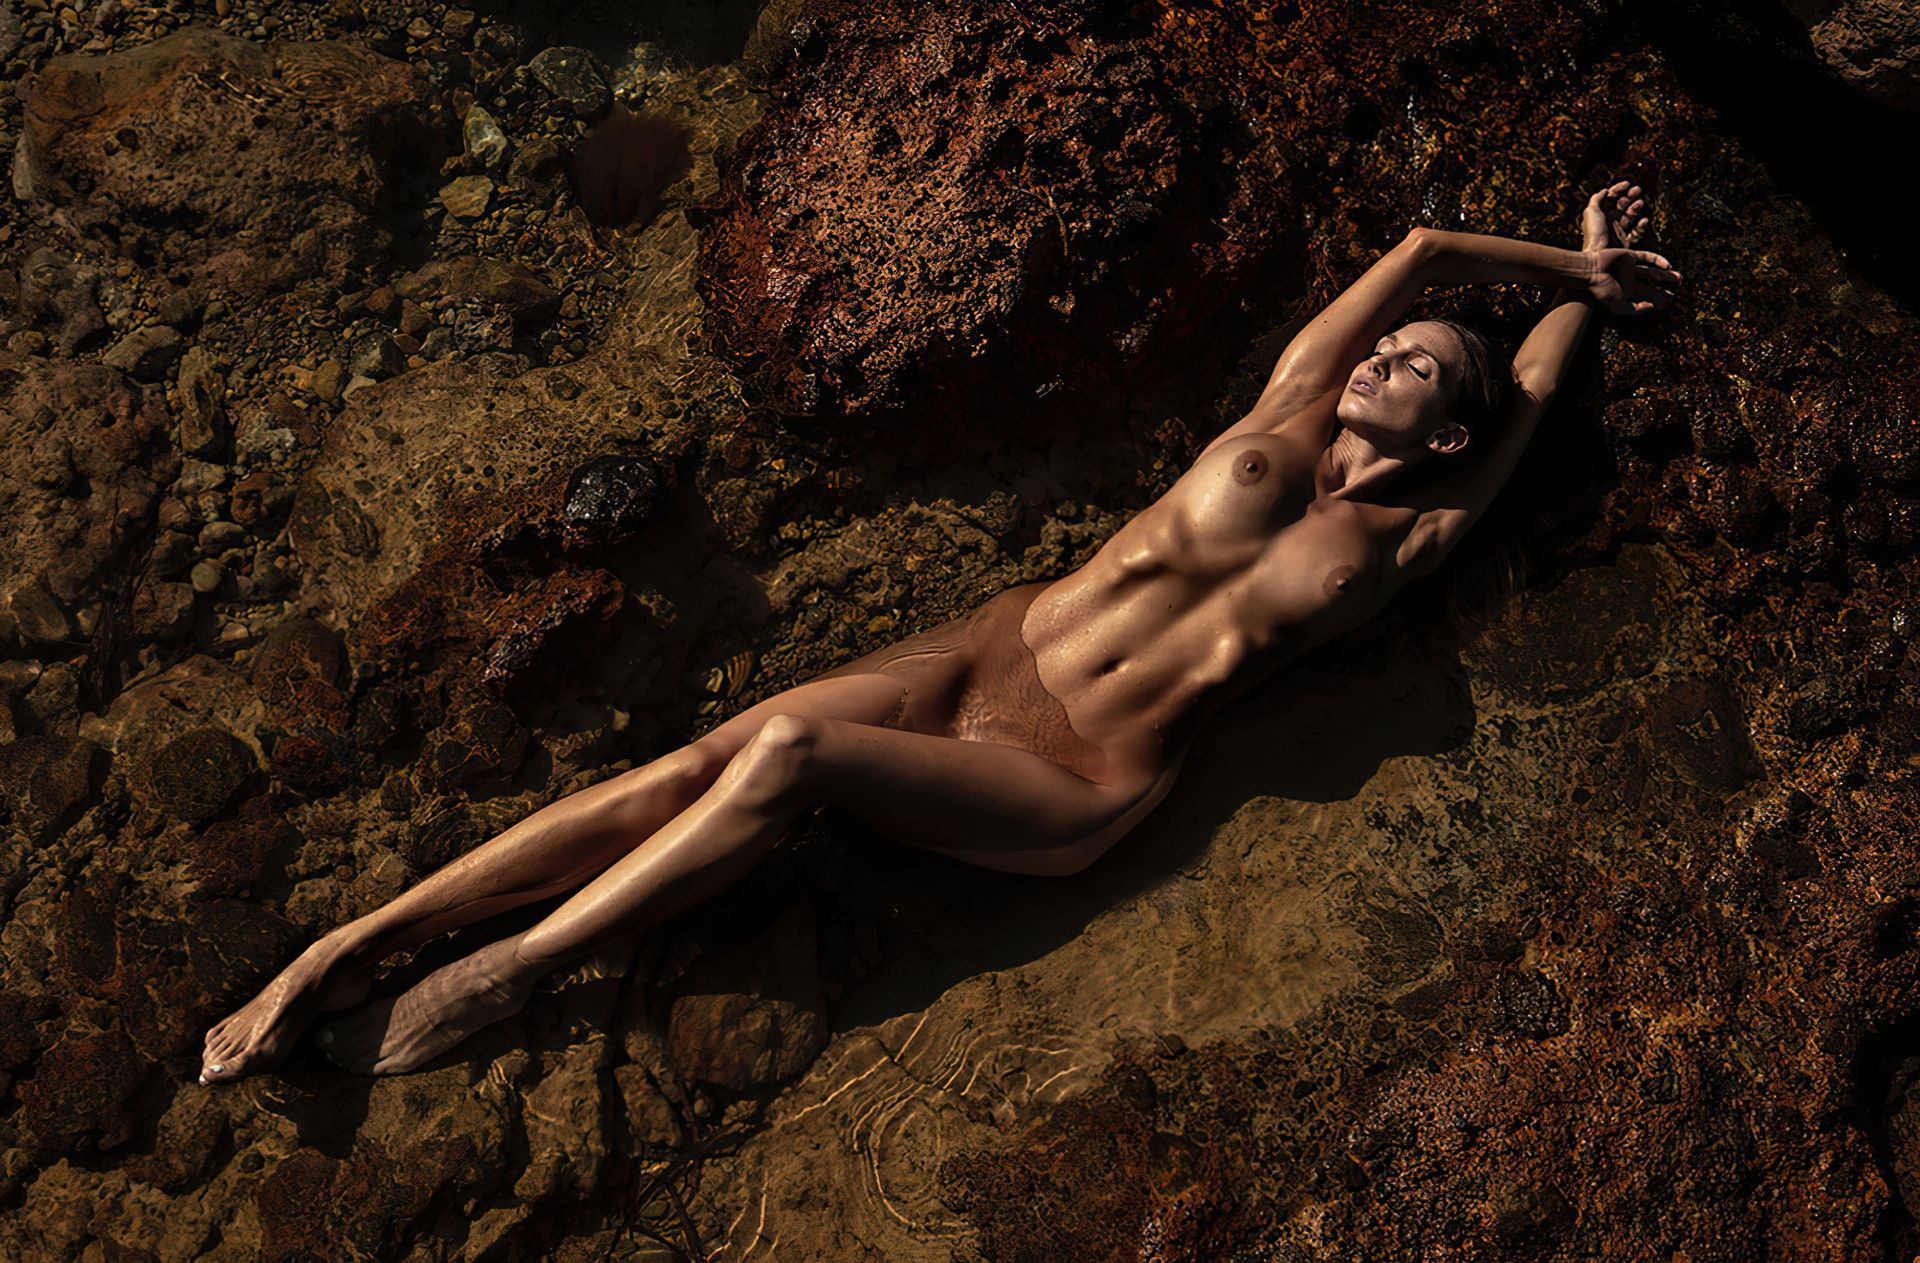 Amanda detmer naked pictures